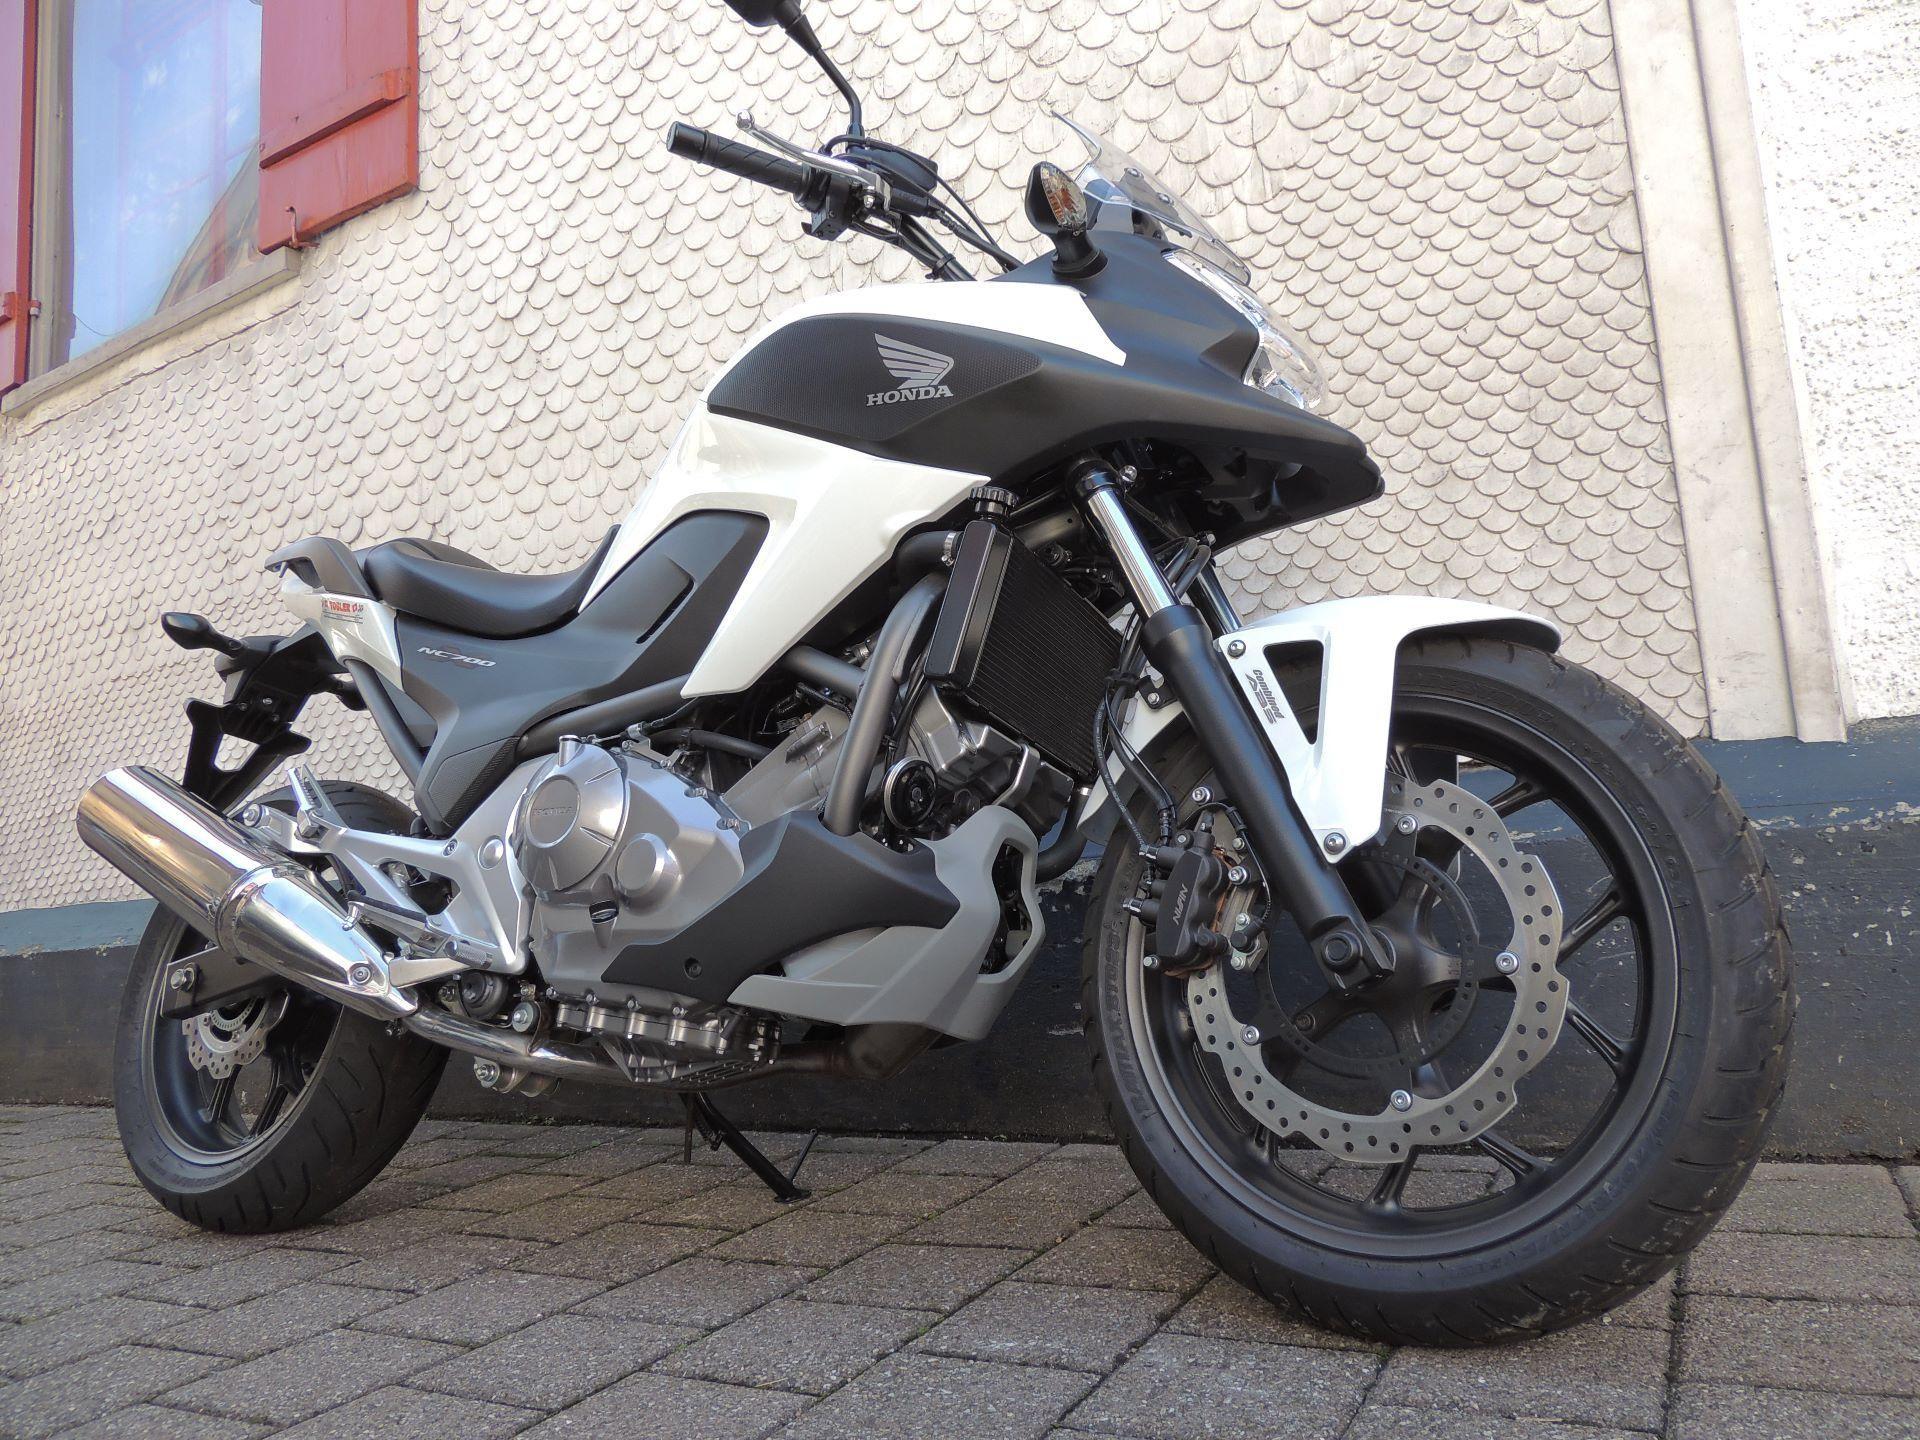 motorrad occasion kaufen honda nc 700 xa abs k tobler velos motos gmbh rheineck. Black Bedroom Furniture Sets. Home Design Ideas